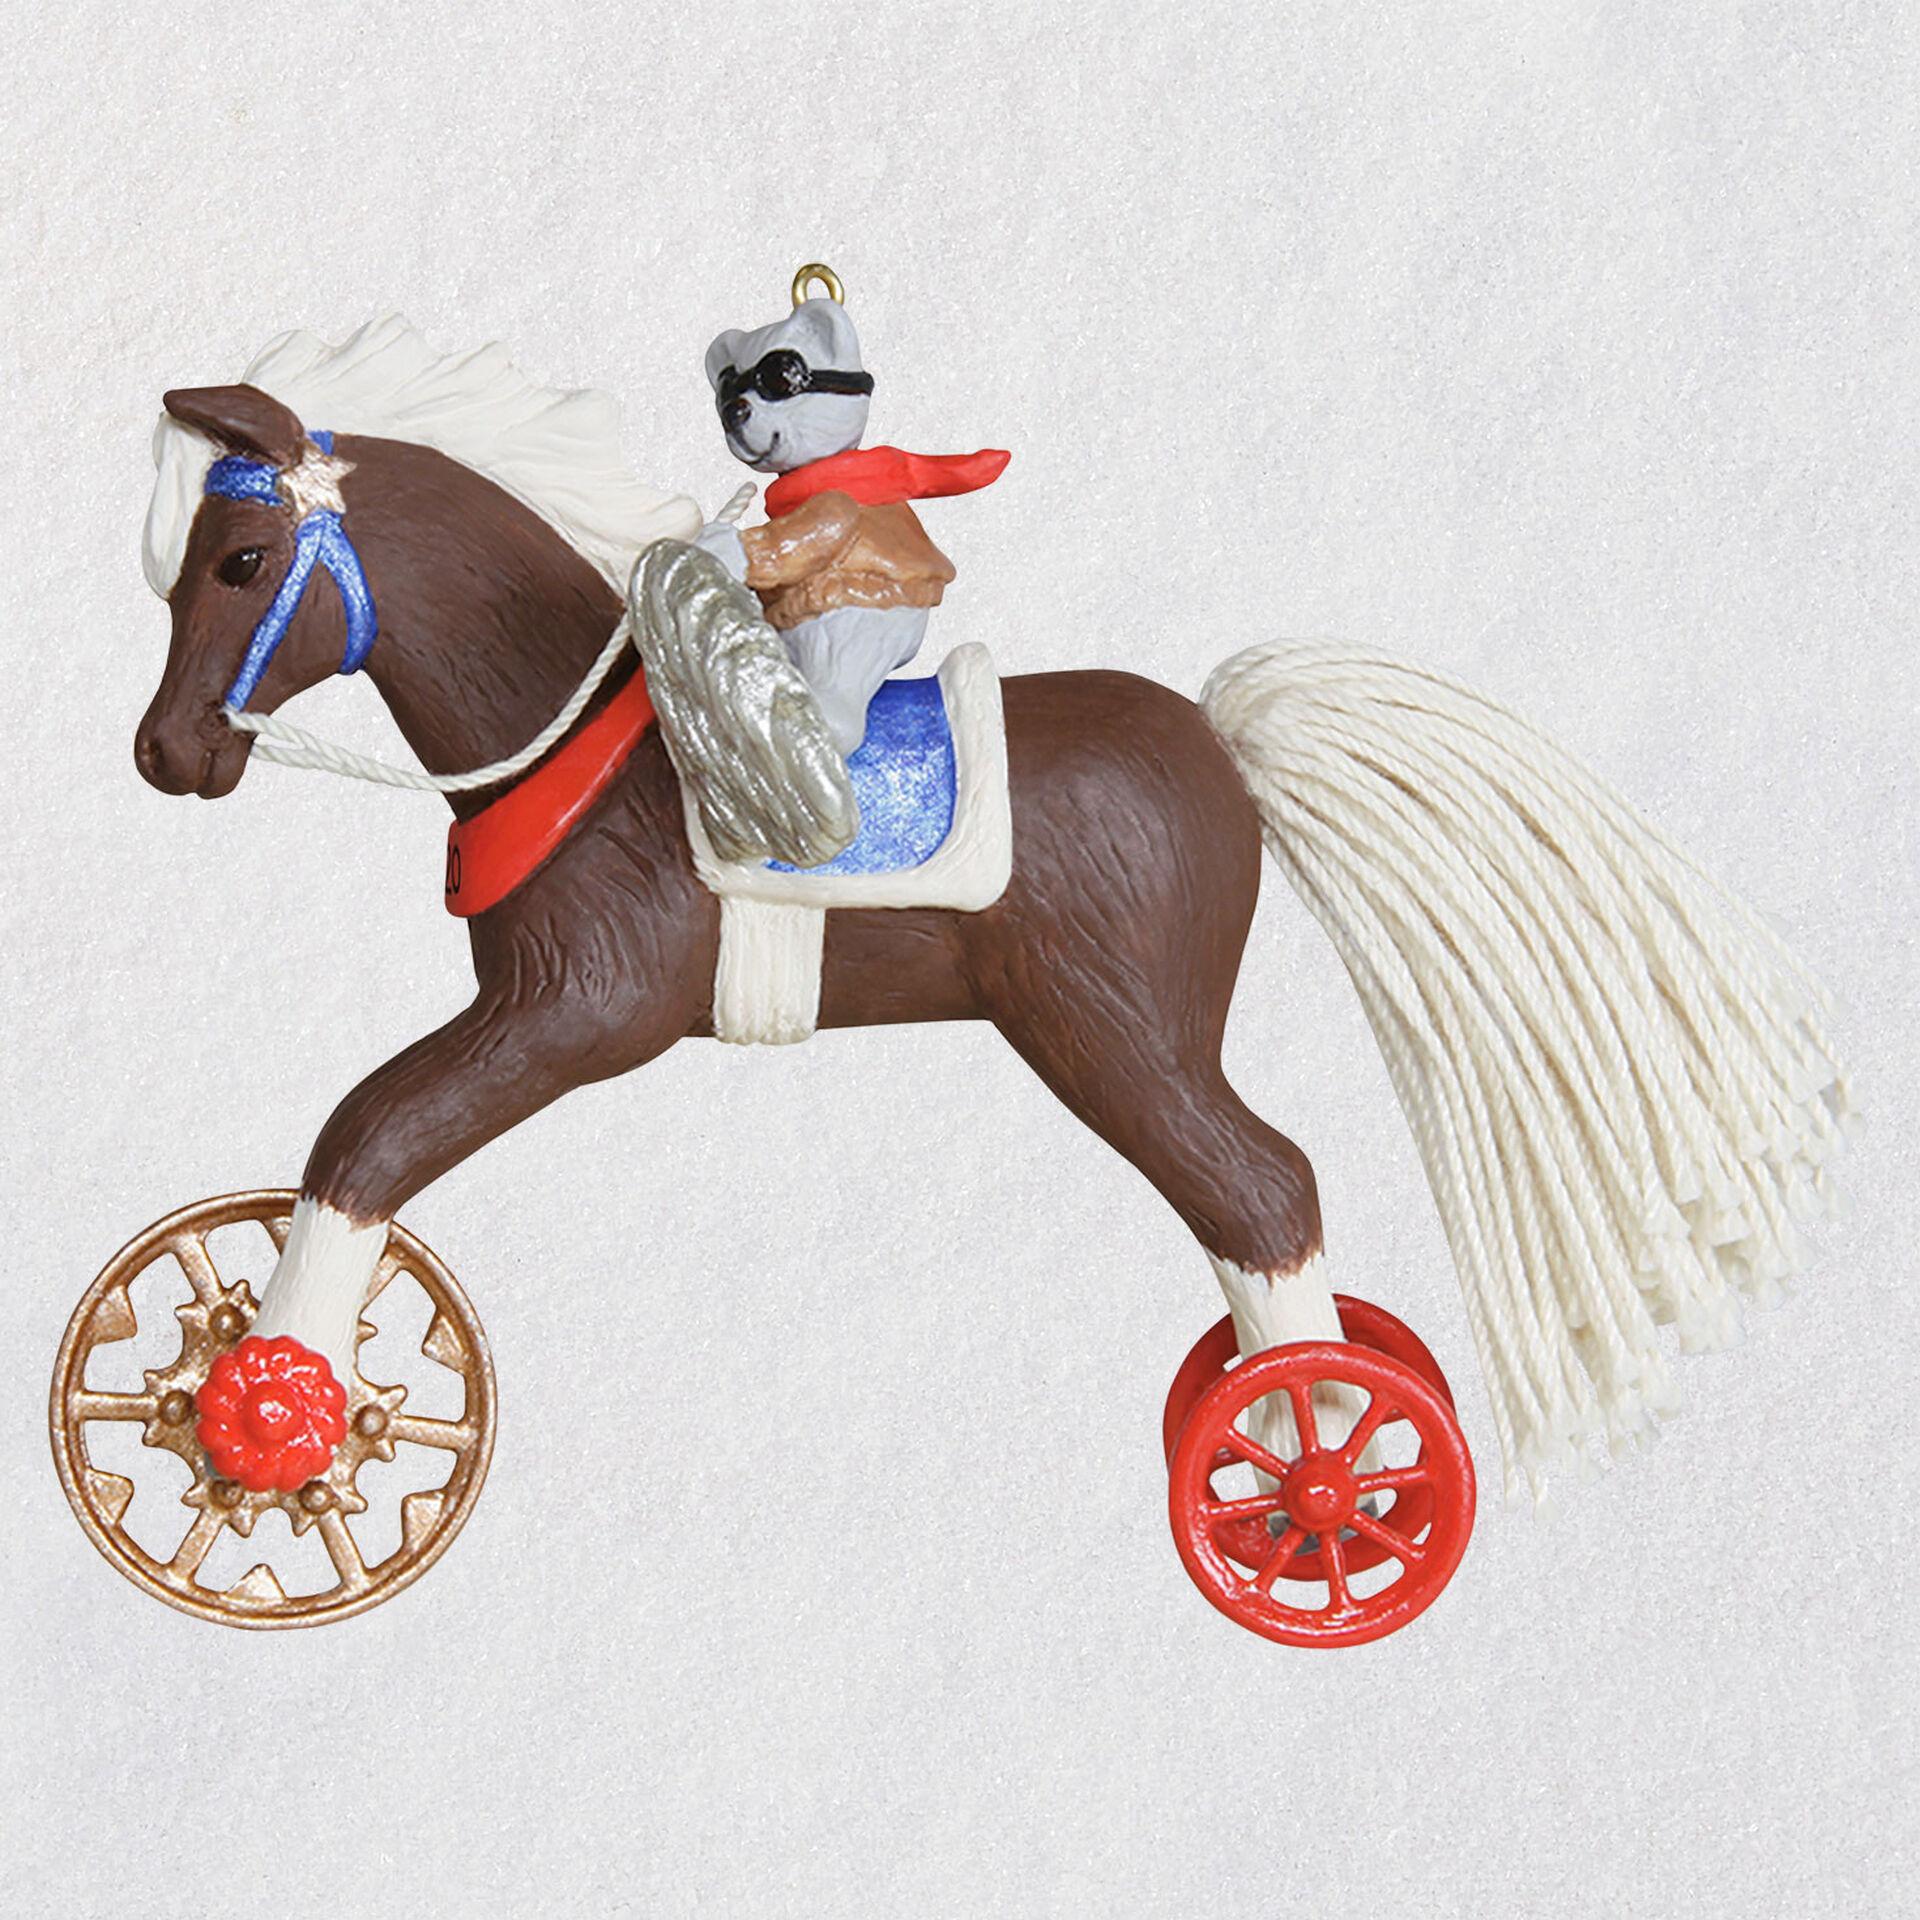 Pony For Christmas 2020 A Pony for Christmas 2020 Ornament   Keepsake Ornaments   Hallmark